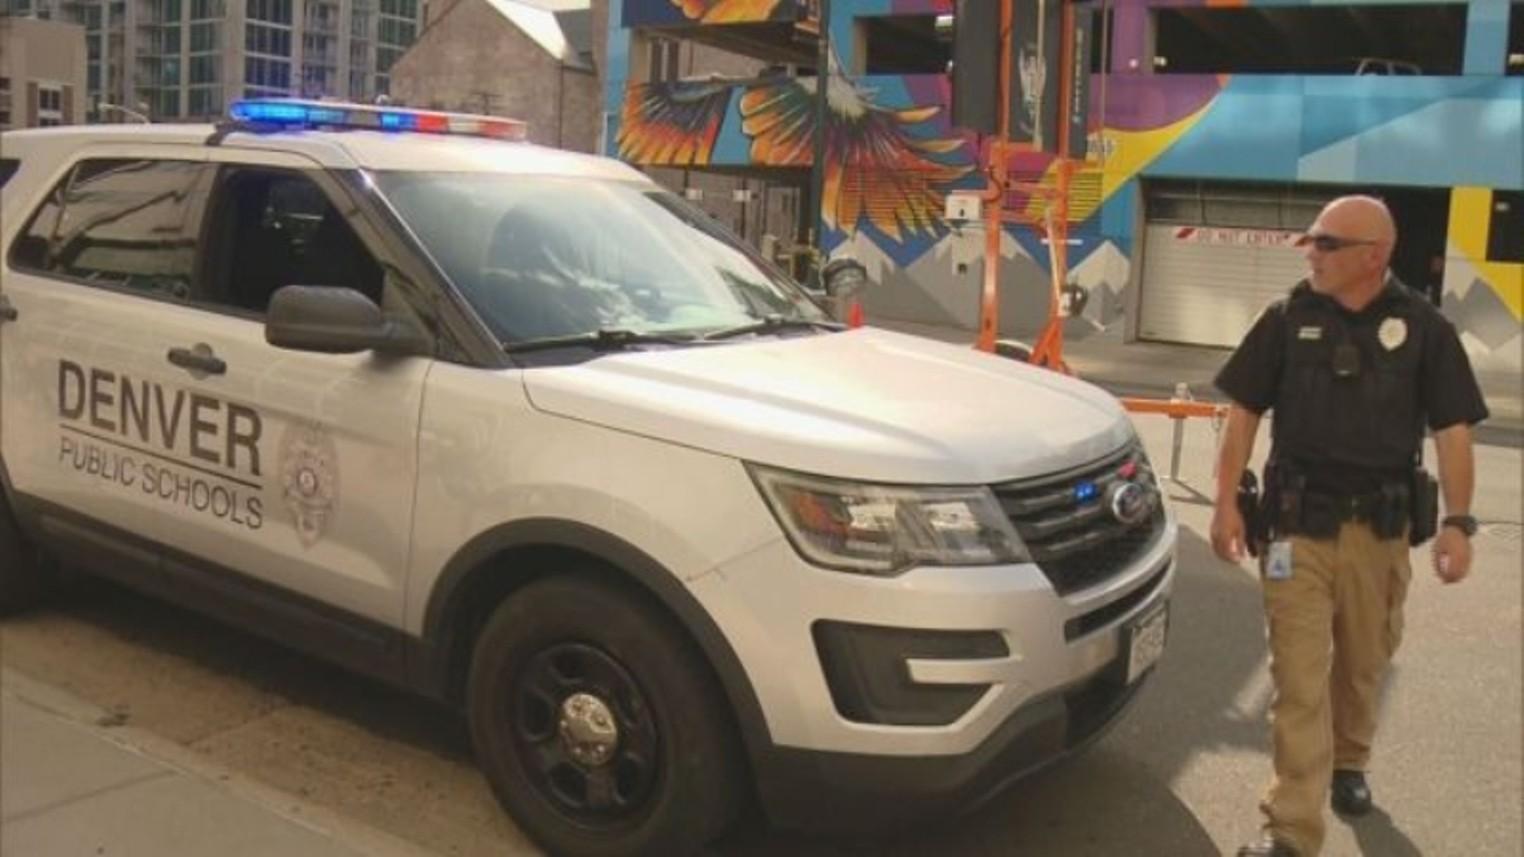 Is Denver Public Schools Reneging on Police-Free Schools Pledge?